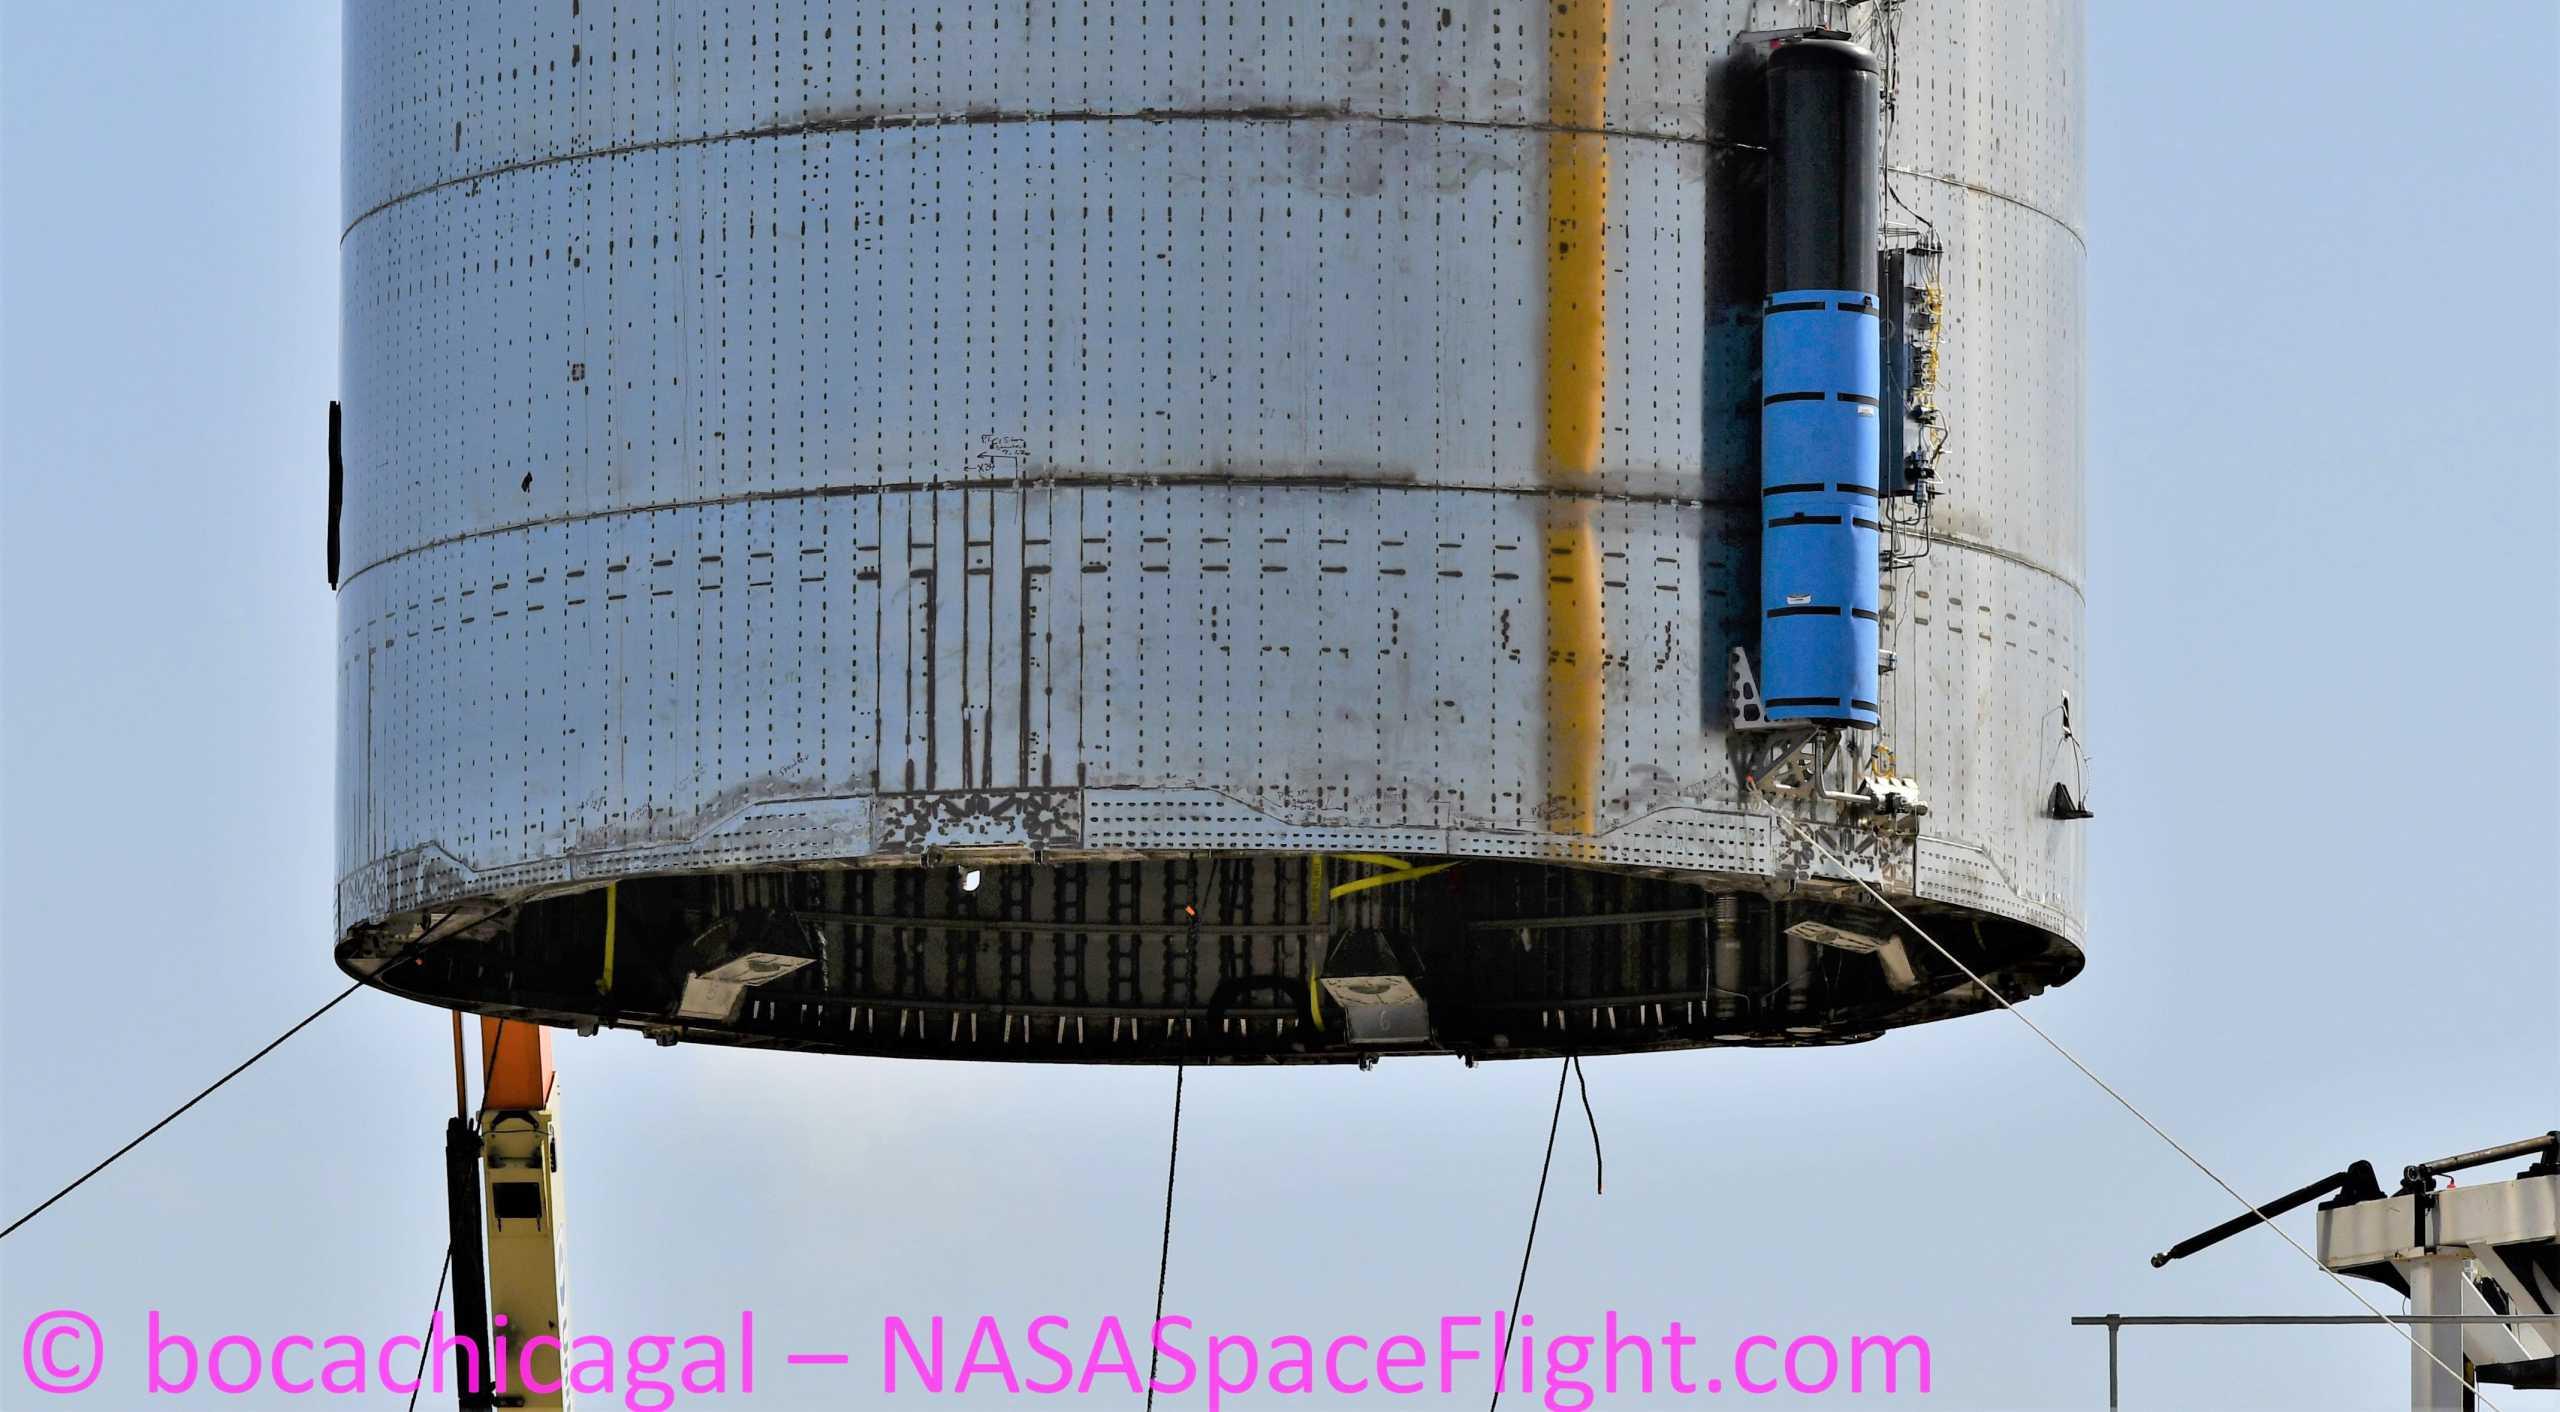 Starship Boca Chica 081220 (NASASpaceflight – bocachicagal) SN6 lift 5 crop (c)